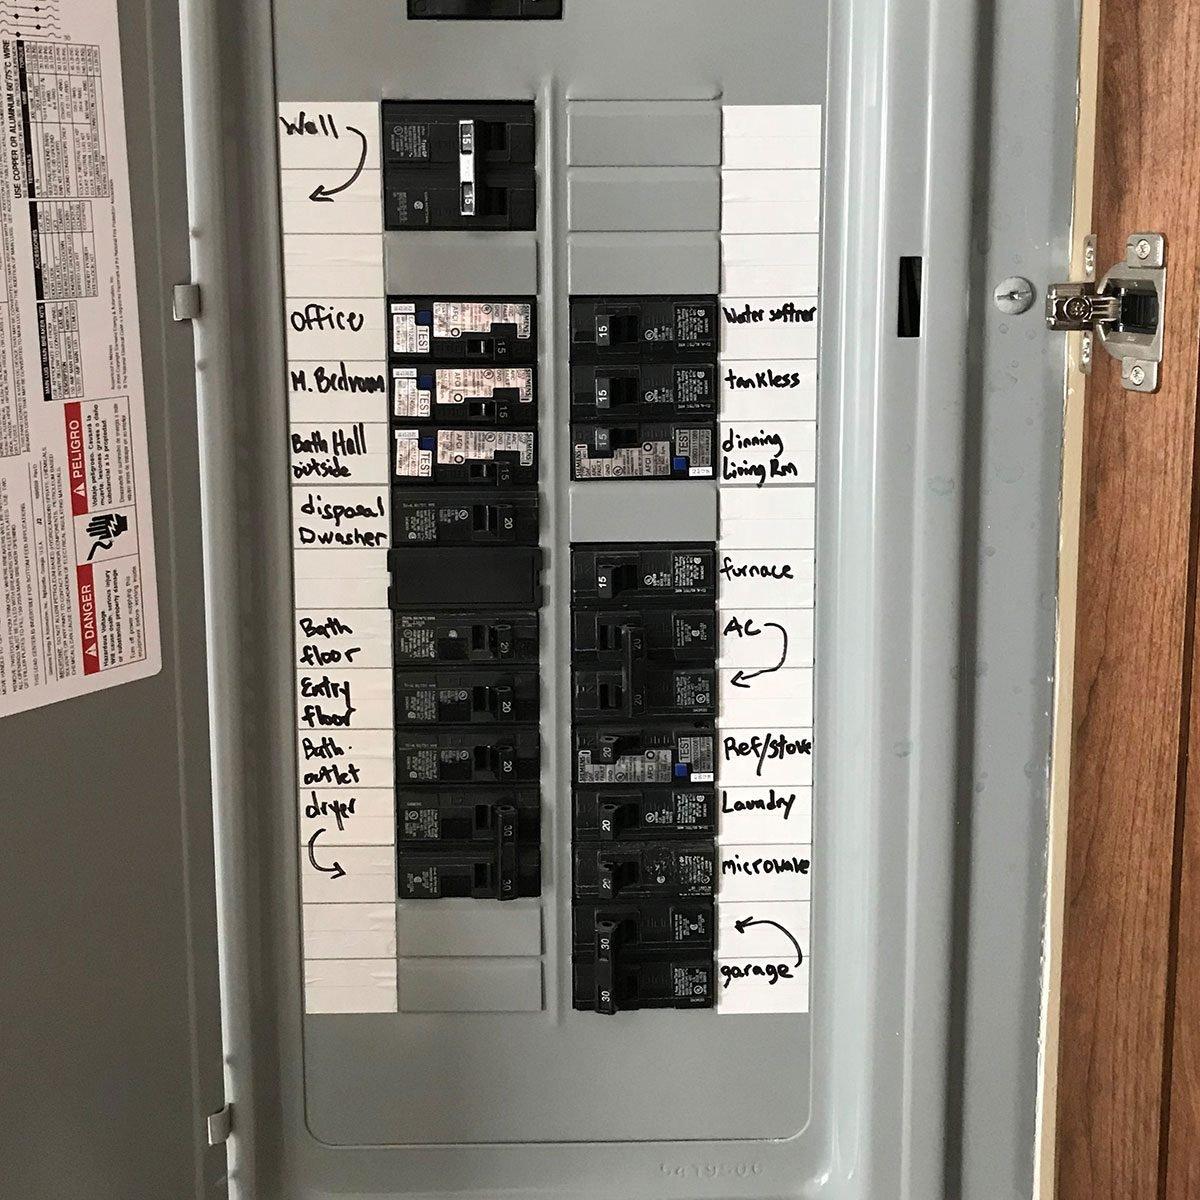 Labeled circuit breakers